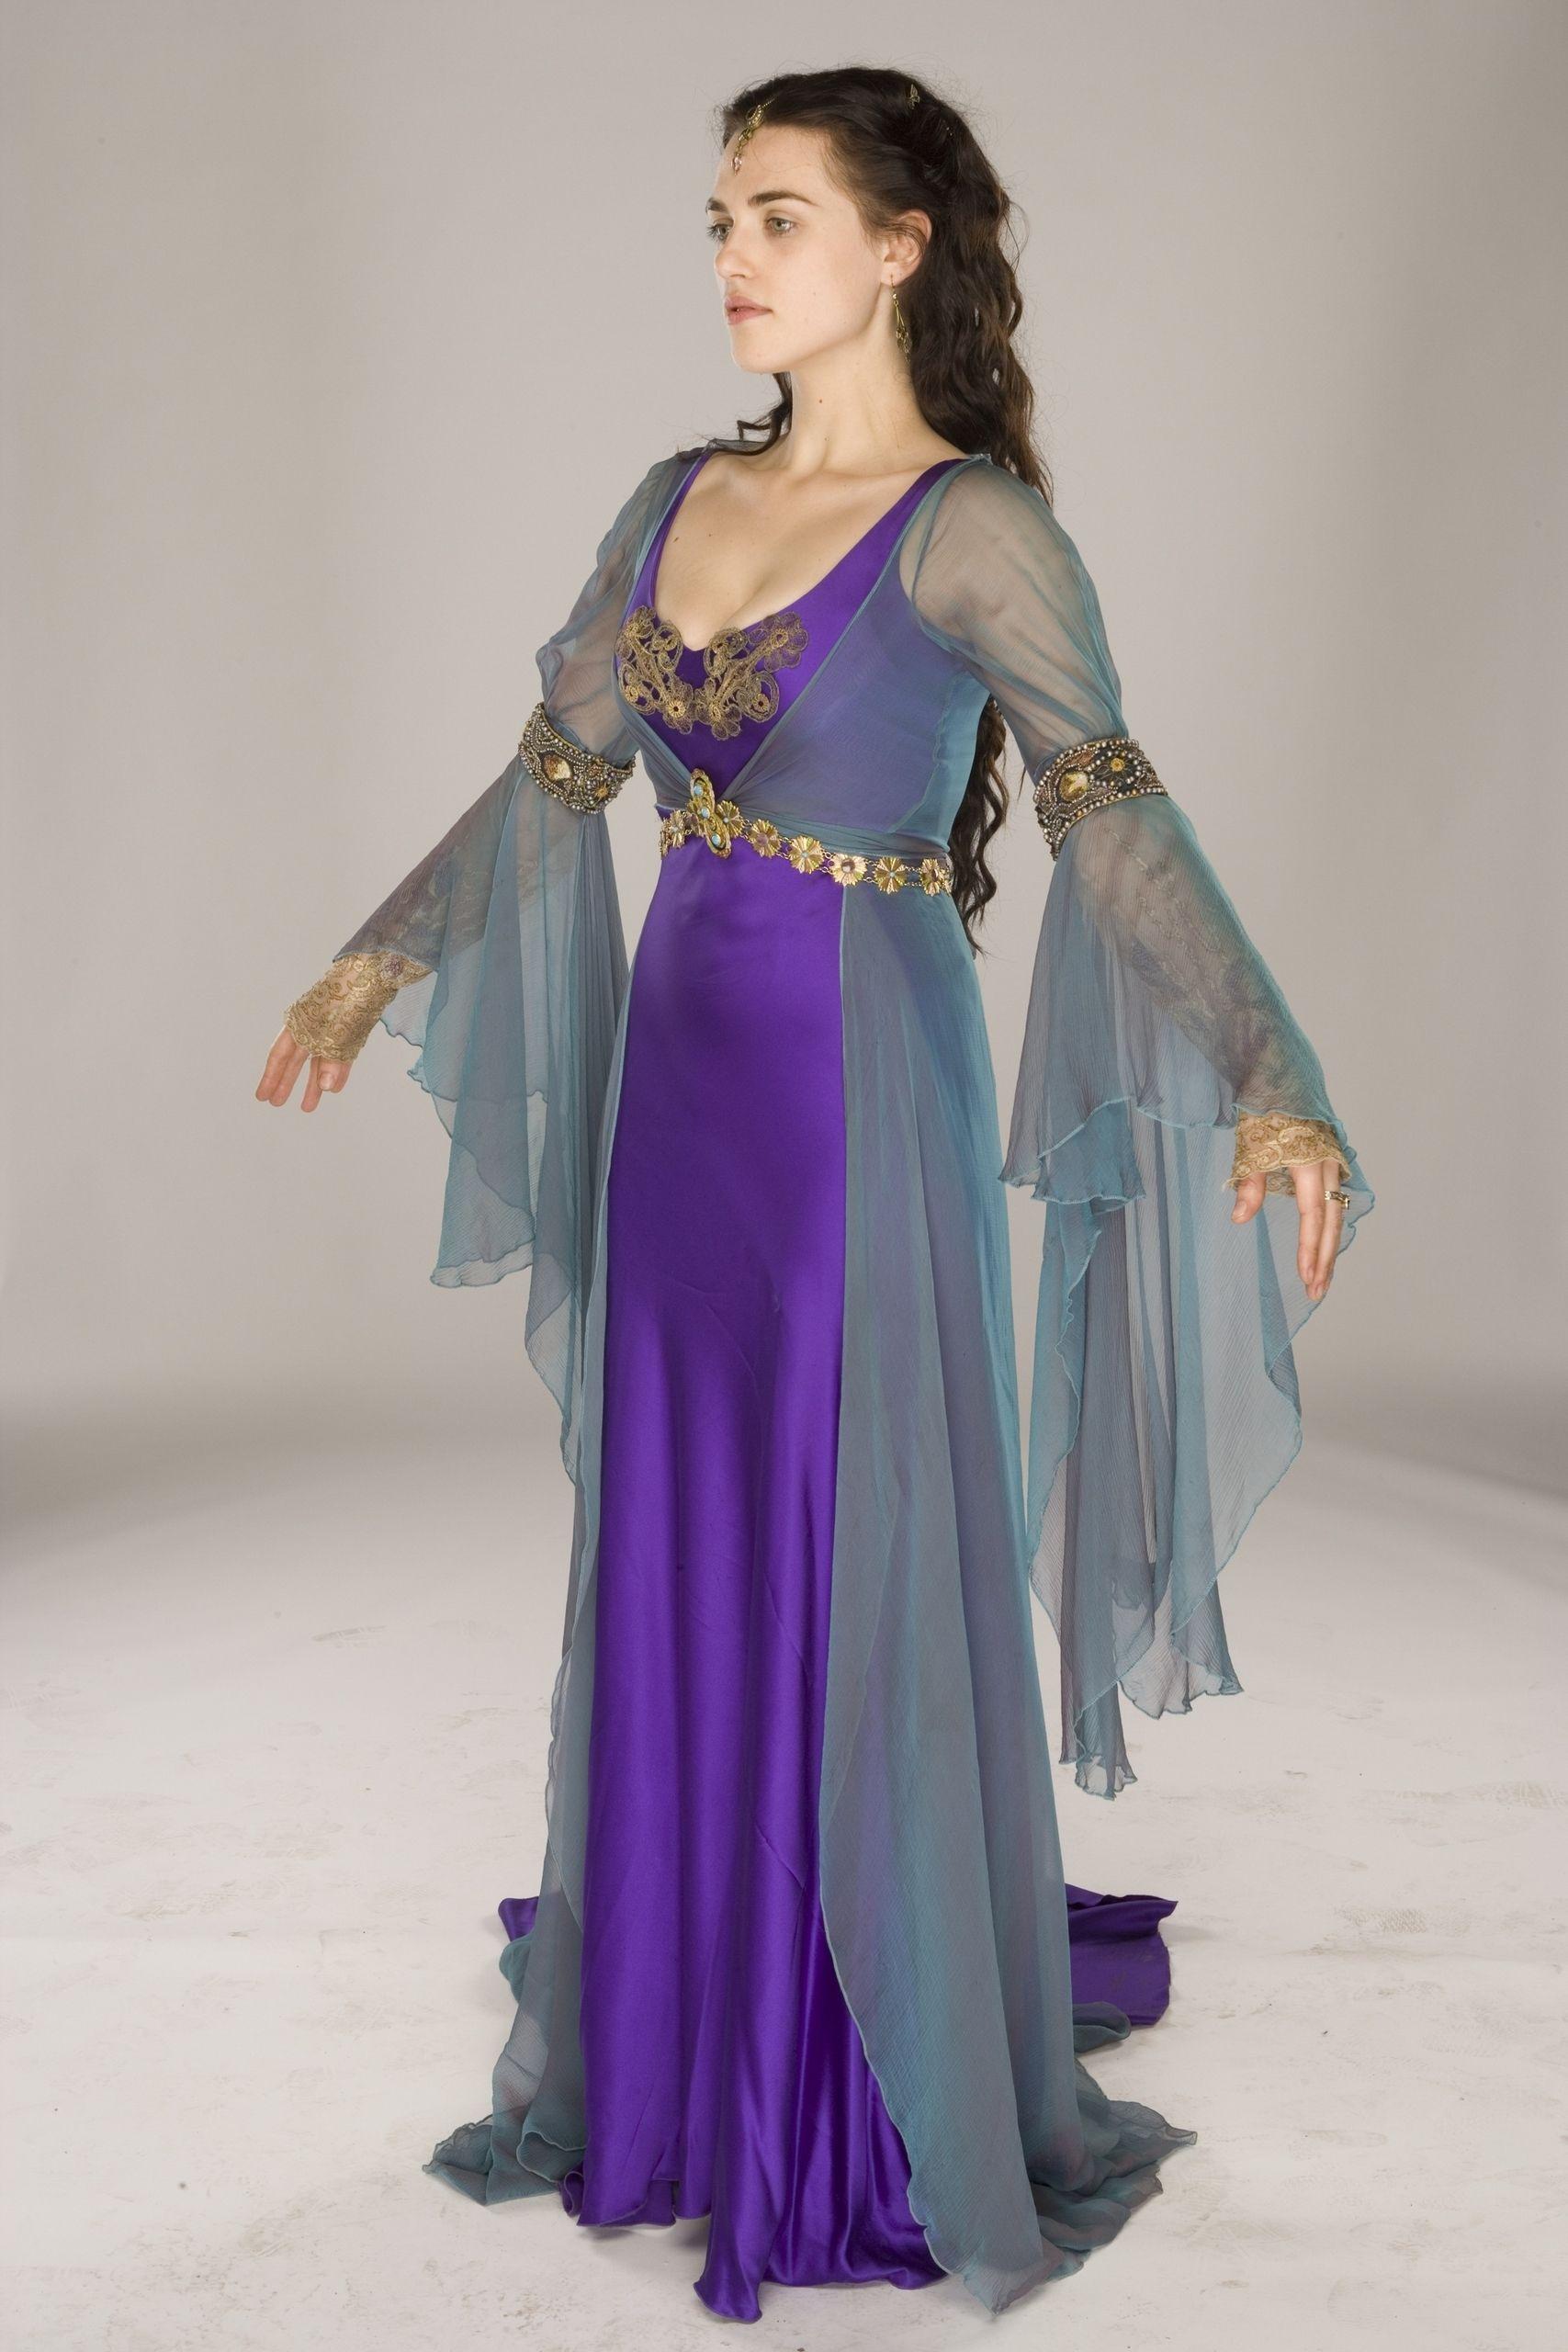 Lady Morgana 1 ª Temporada - merlin-on-bbc Foto | Costumes and ...